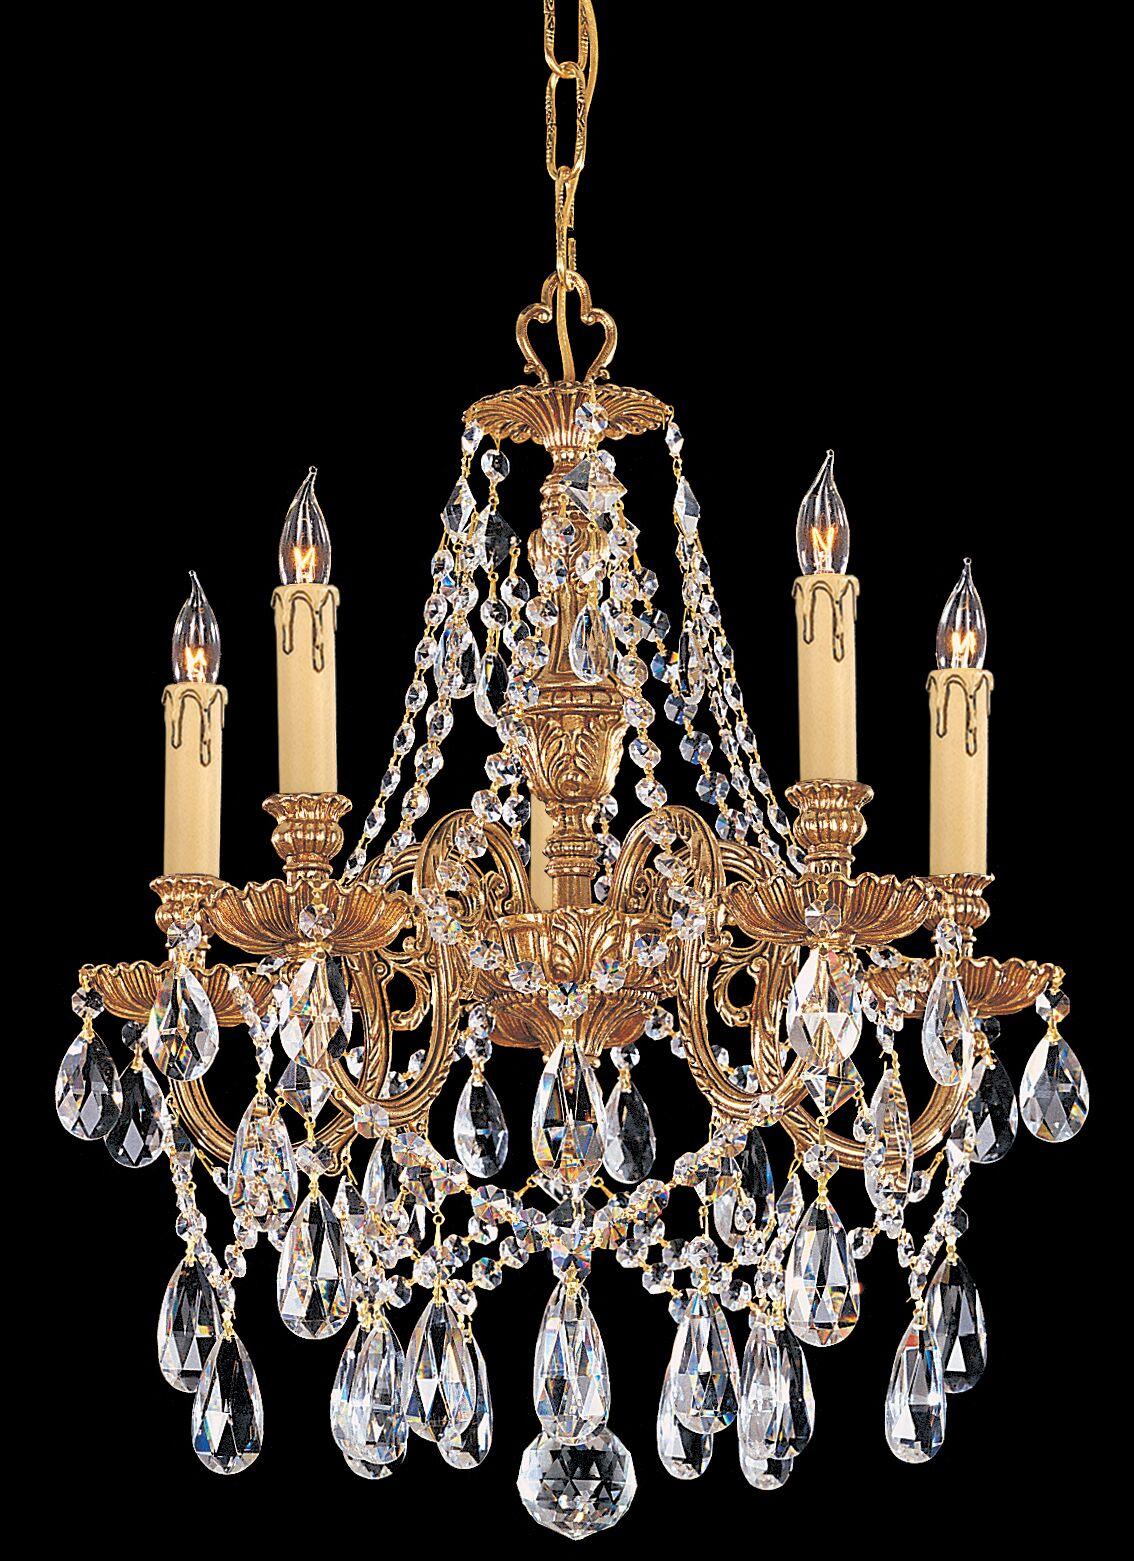 Aureolin 5-Light Crystal Chandelier Crystal Type: Swarovski Strass